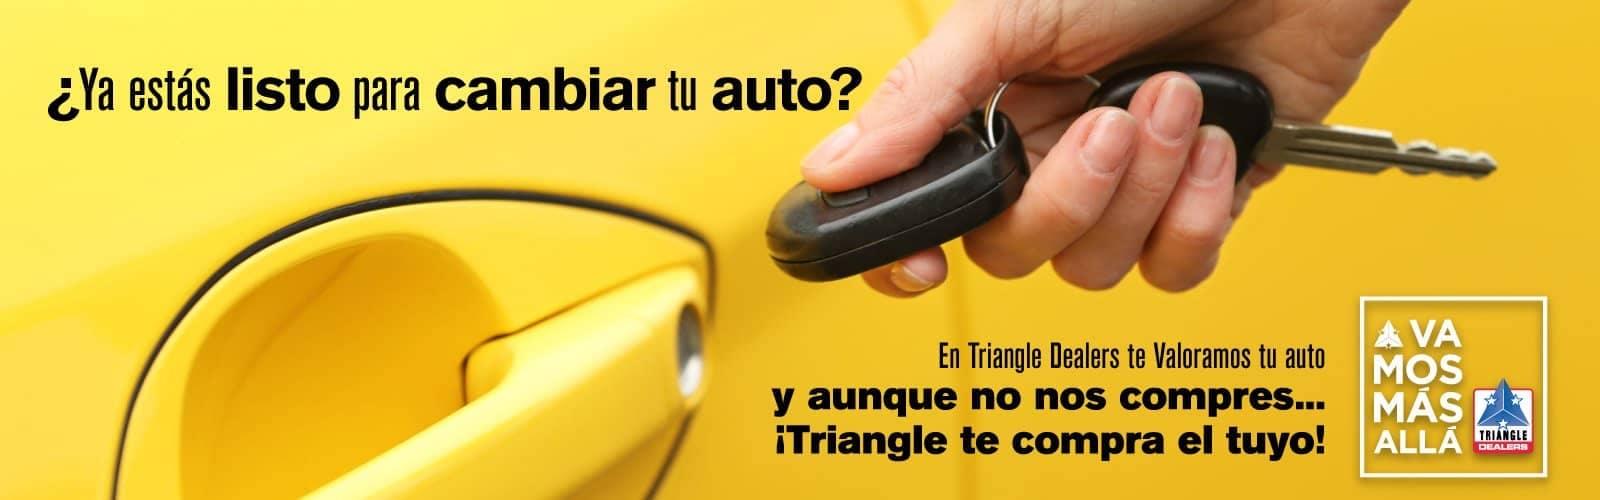 Spanish Banner Image - cambiar tu auto